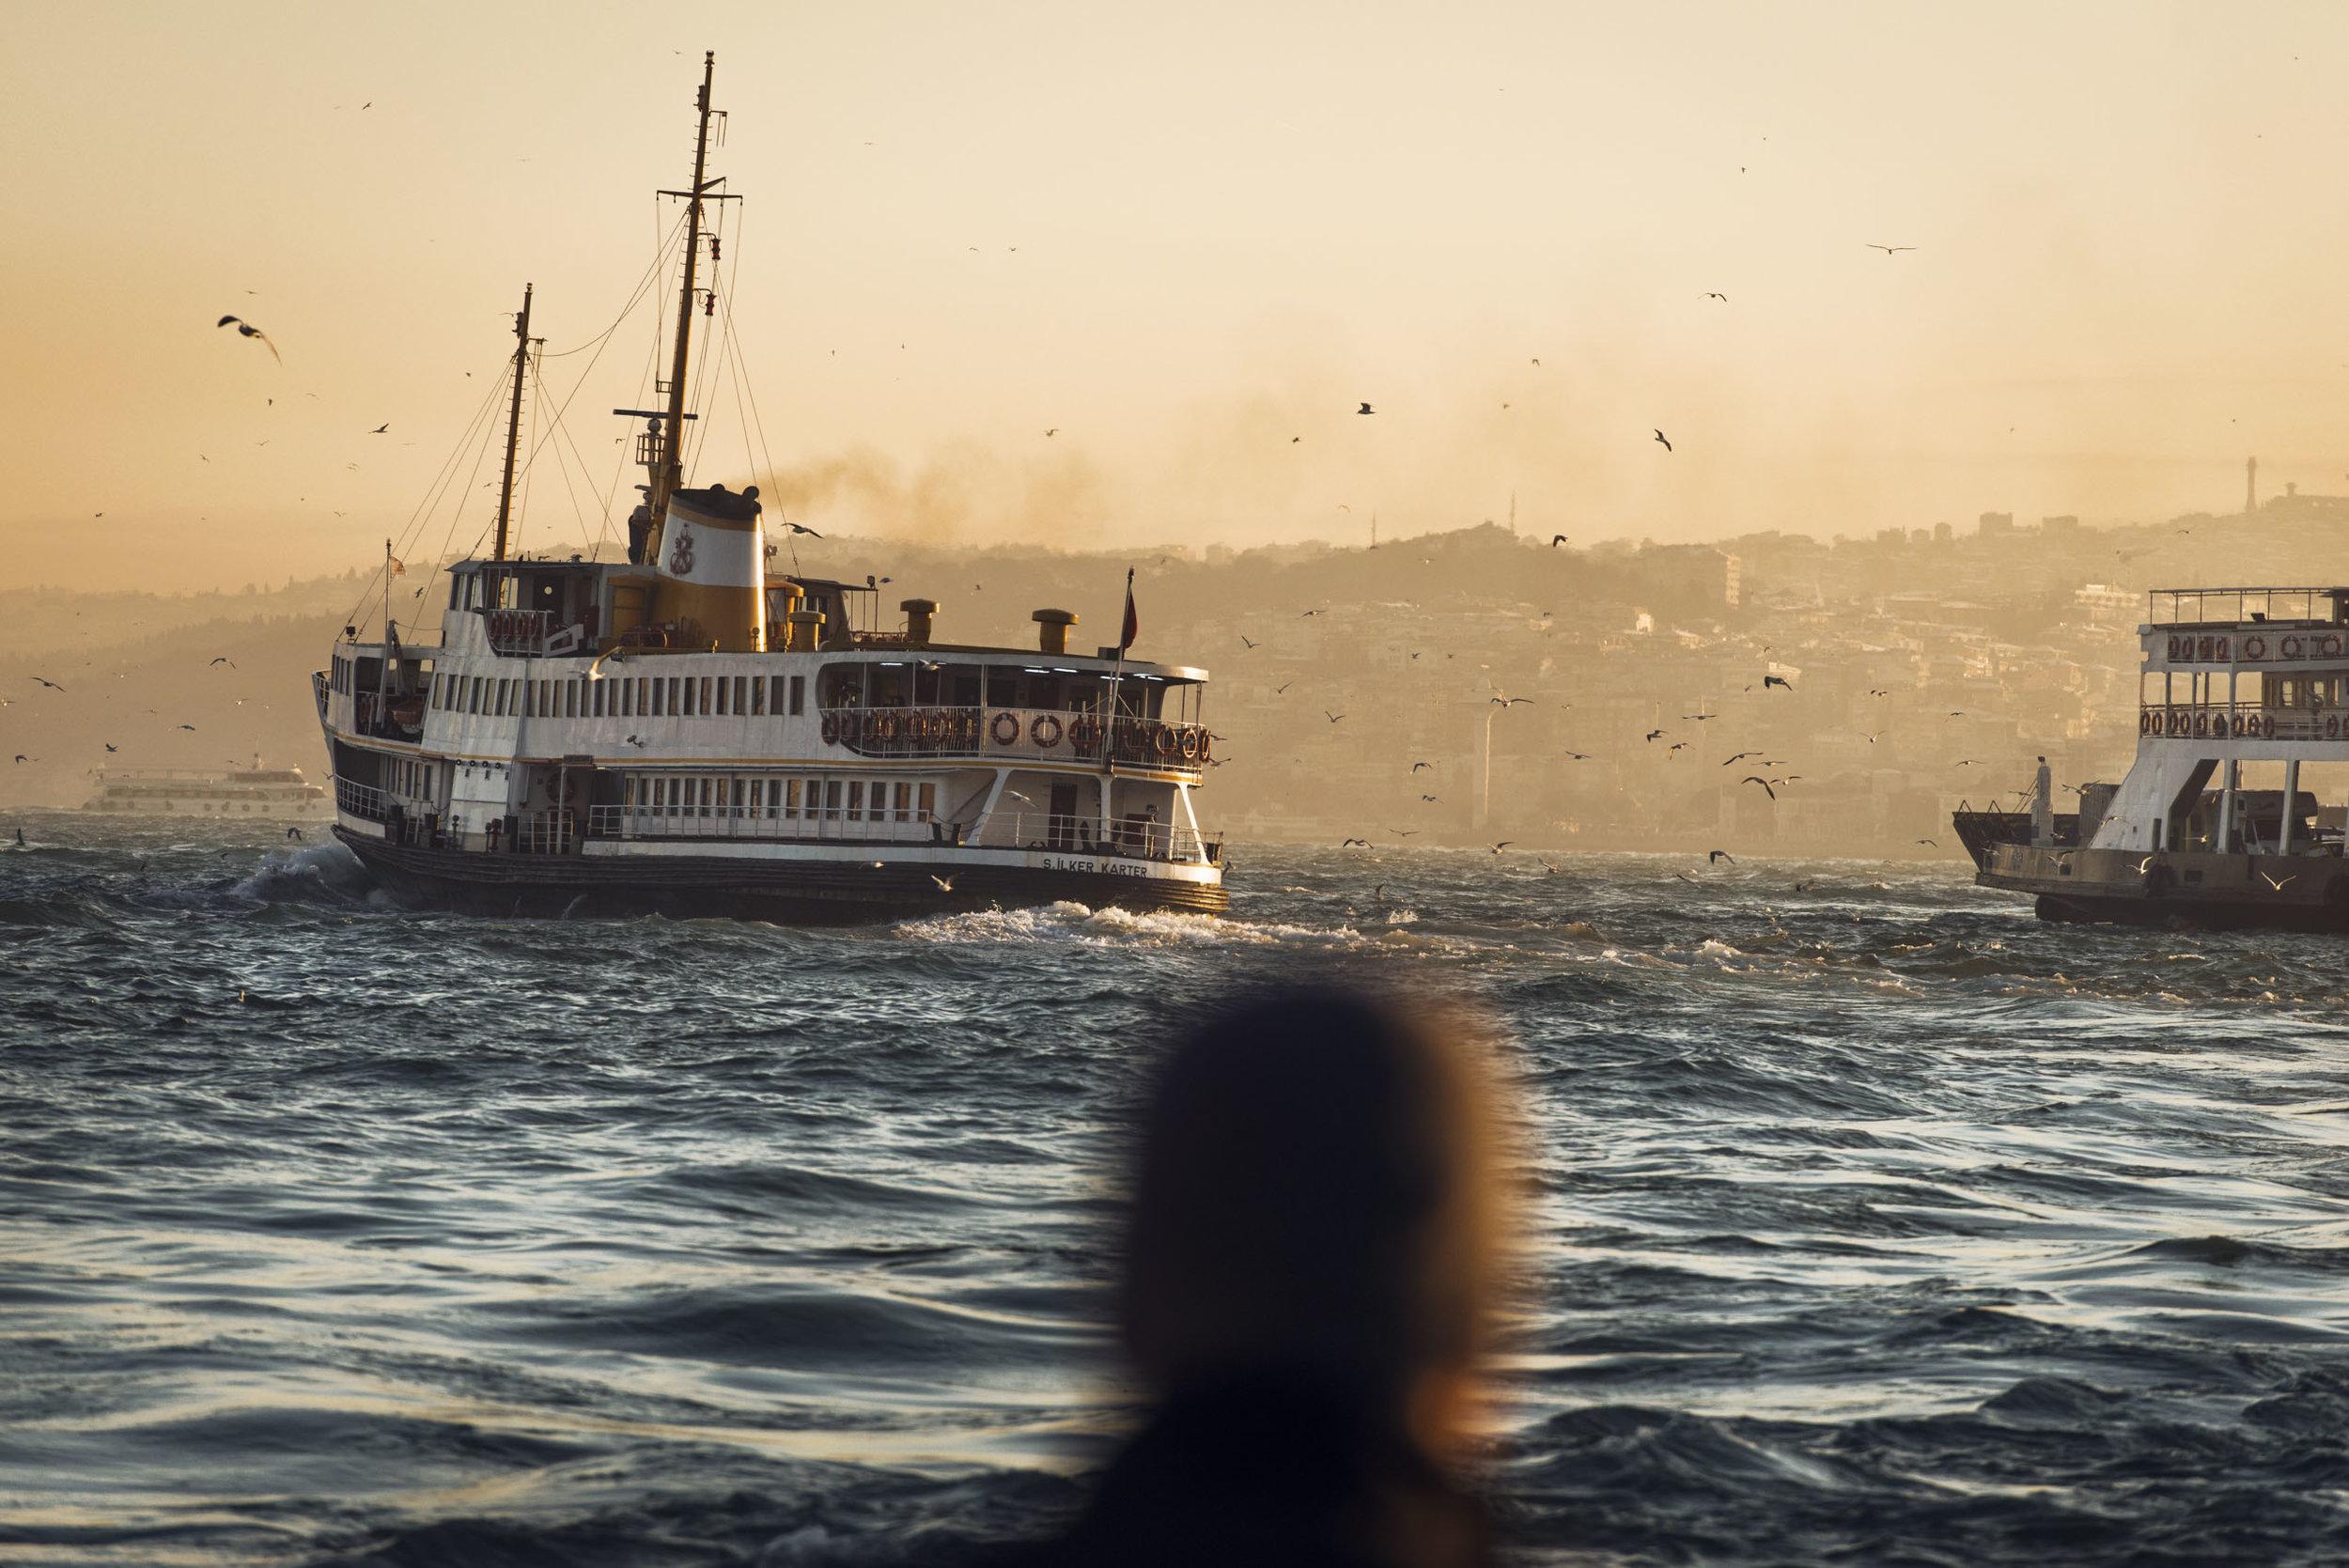 33_STOKES_ISTANBUL_01.JPG